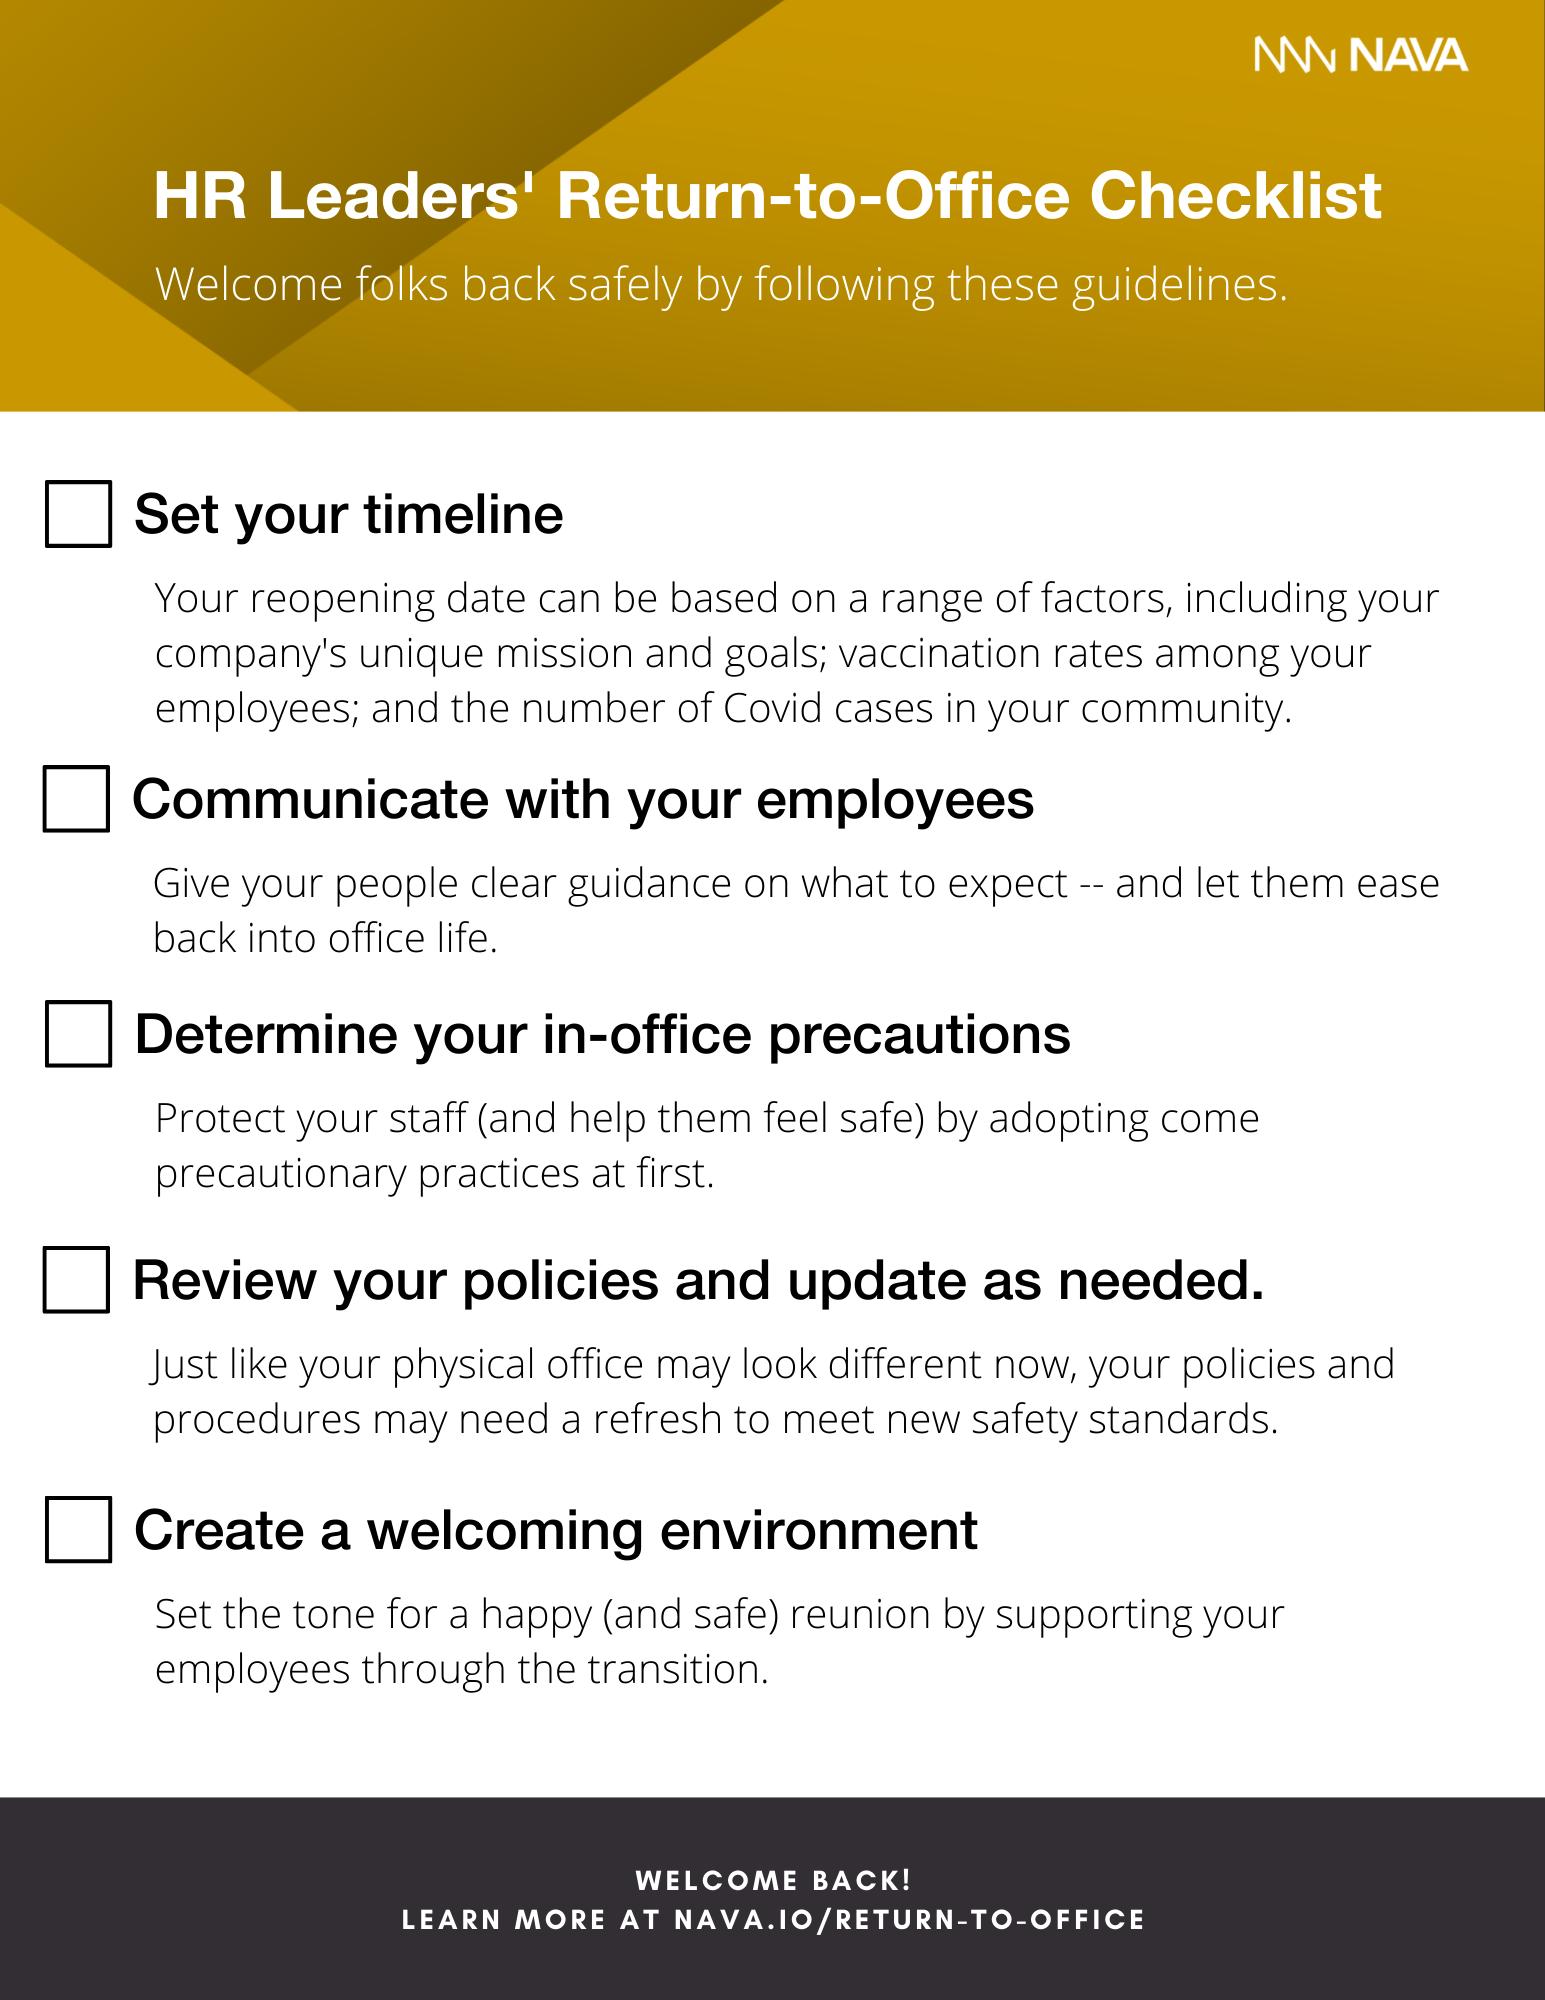 HR Leaders' Return-to-Office Checklist